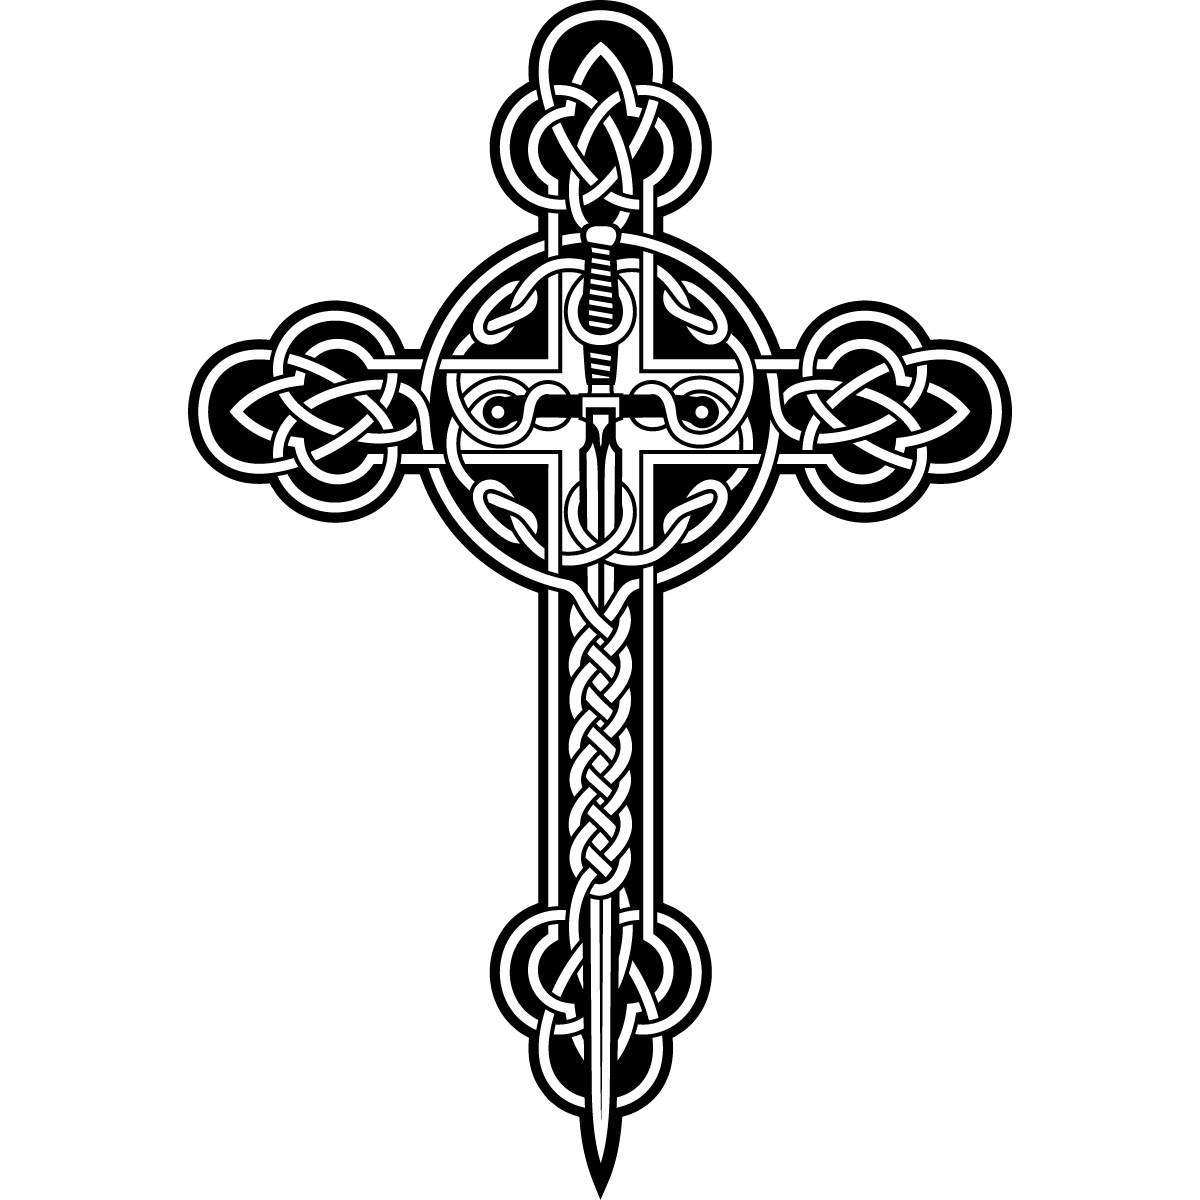 Celtic Cross Clip Art - .-Celtic Cross Clip Art - .-6